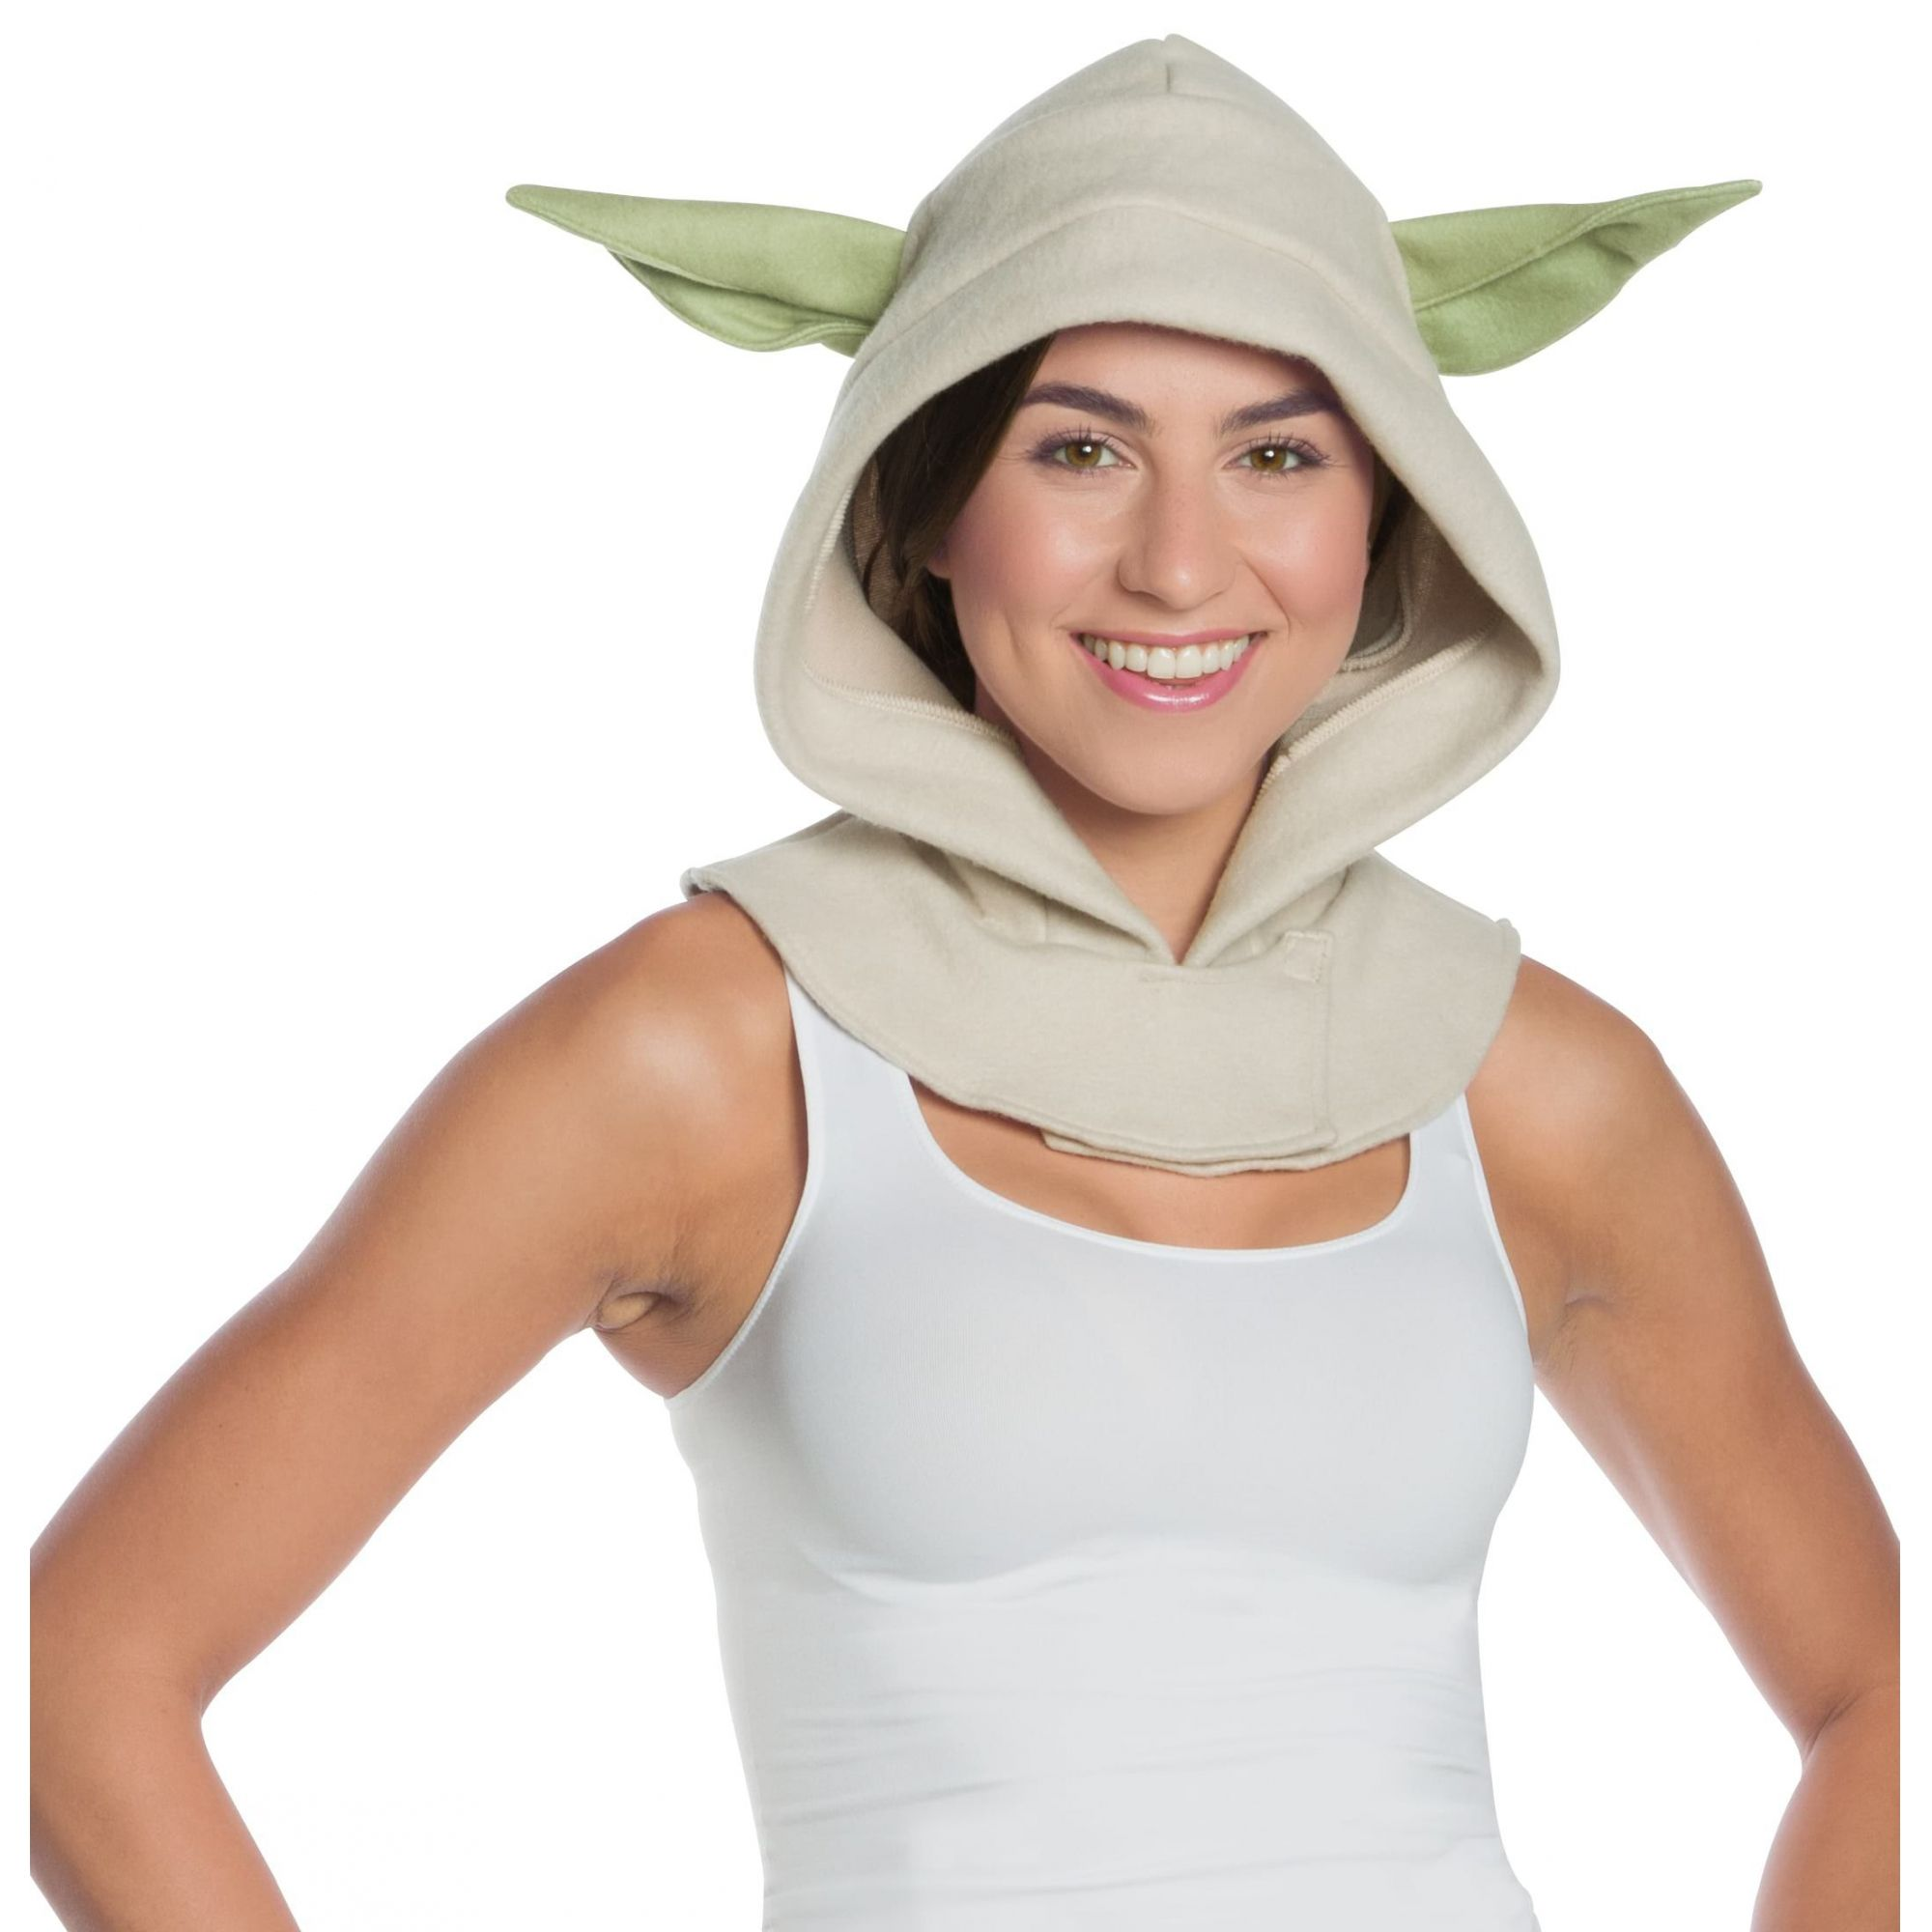 Capuz Mestre Yoda : Star Wars (Acessório Fantasia) - Rubies Costume - CD